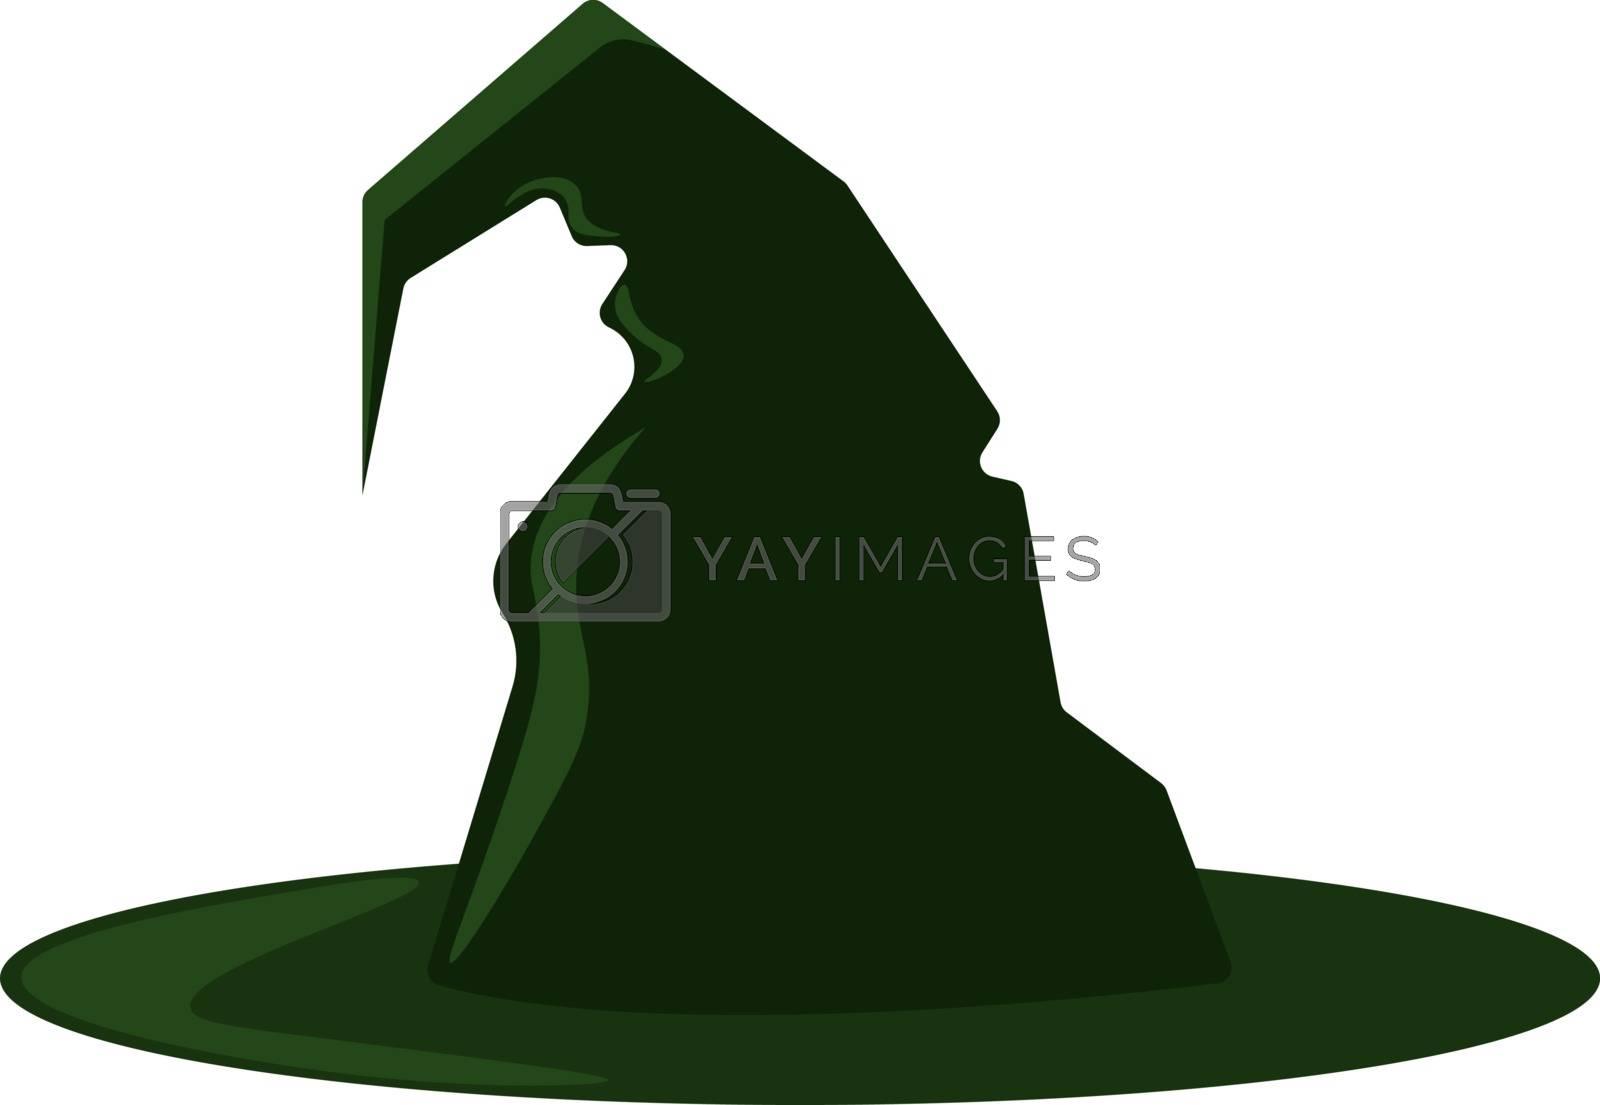 Green hat, illustration, vector on white background.